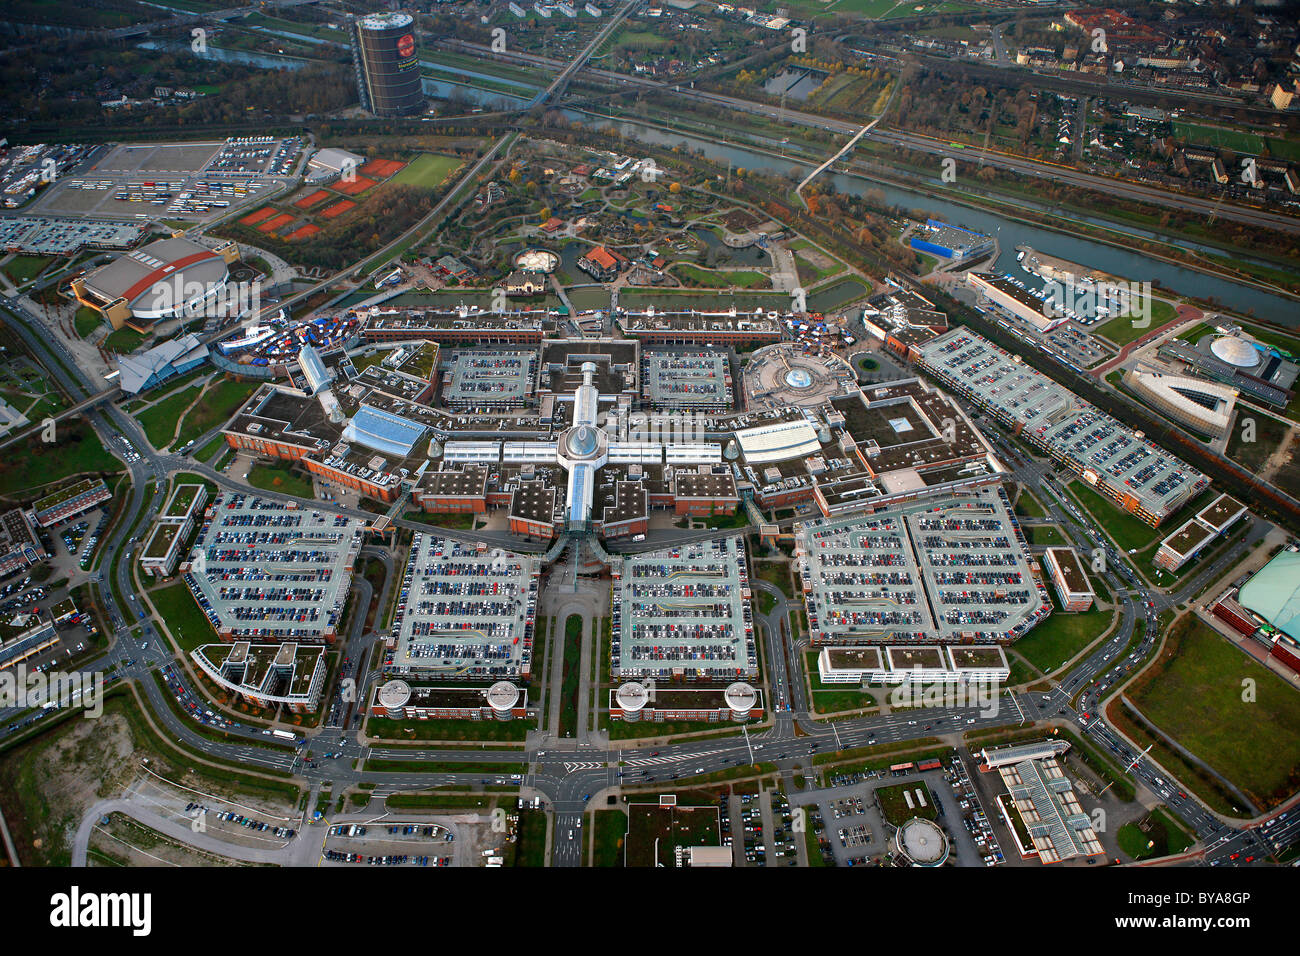 aerial view christmas market centro mall neue mitte oberhausen stock photo 34032342 alamy. Black Bedroom Furniture Sets. Home Design Ideas